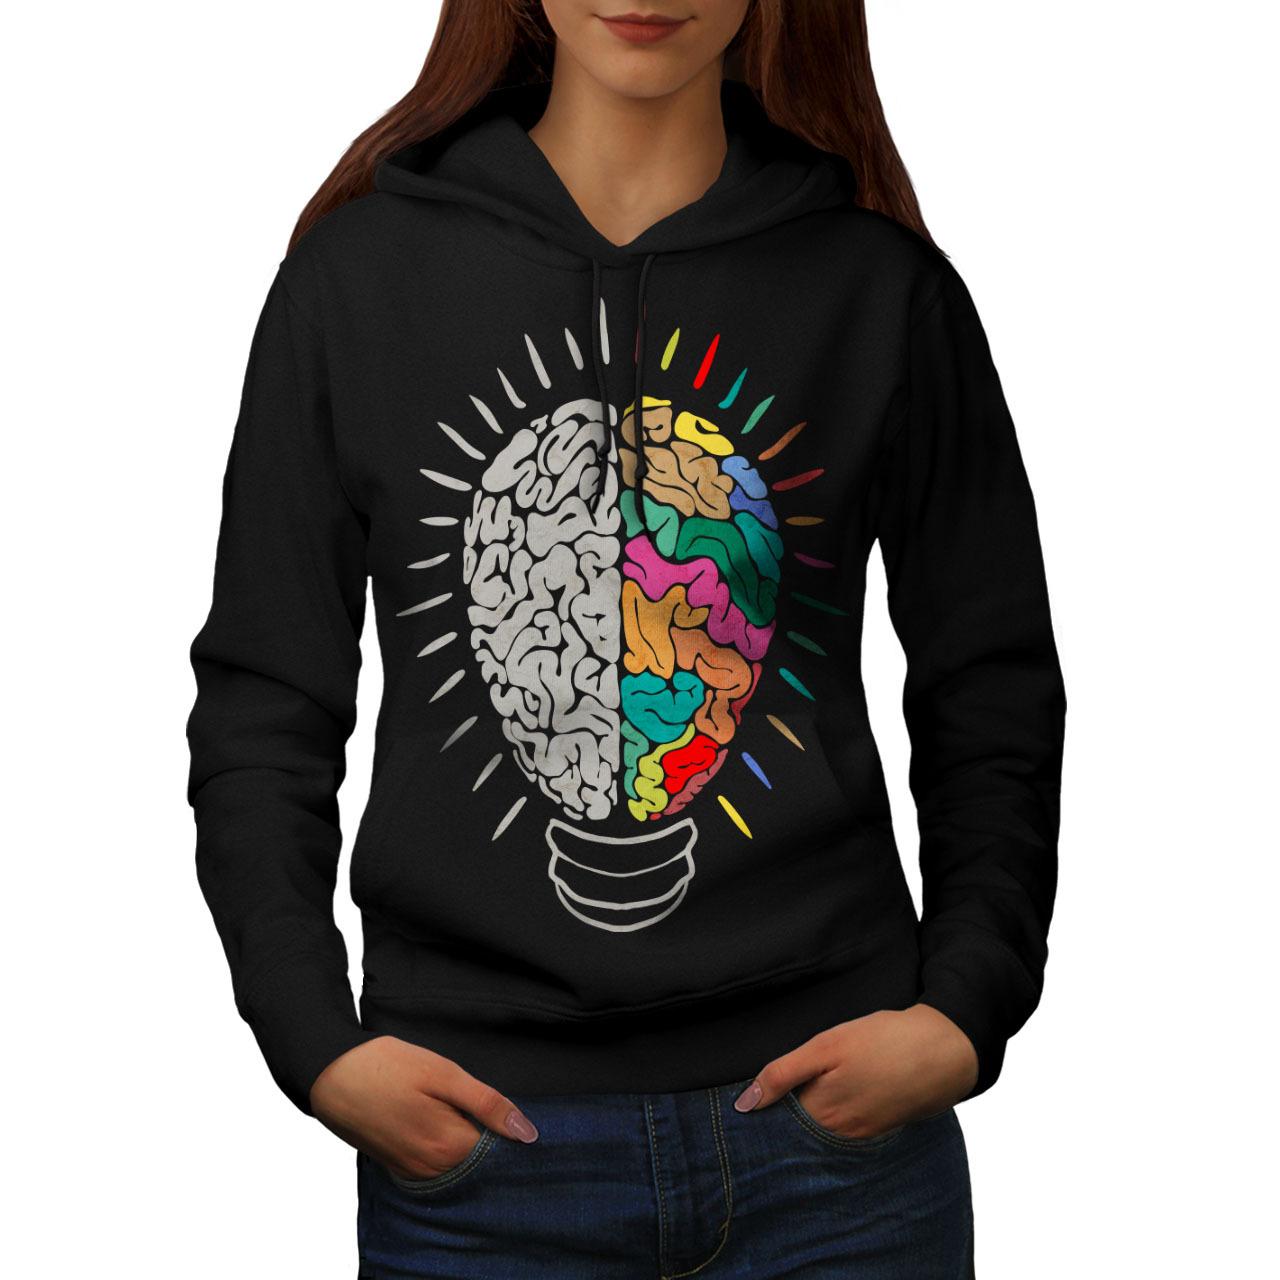 Creative Brain Bulb Sweatshirt Hoody Idea Light Women Hoodie - $21.99 - $22.99